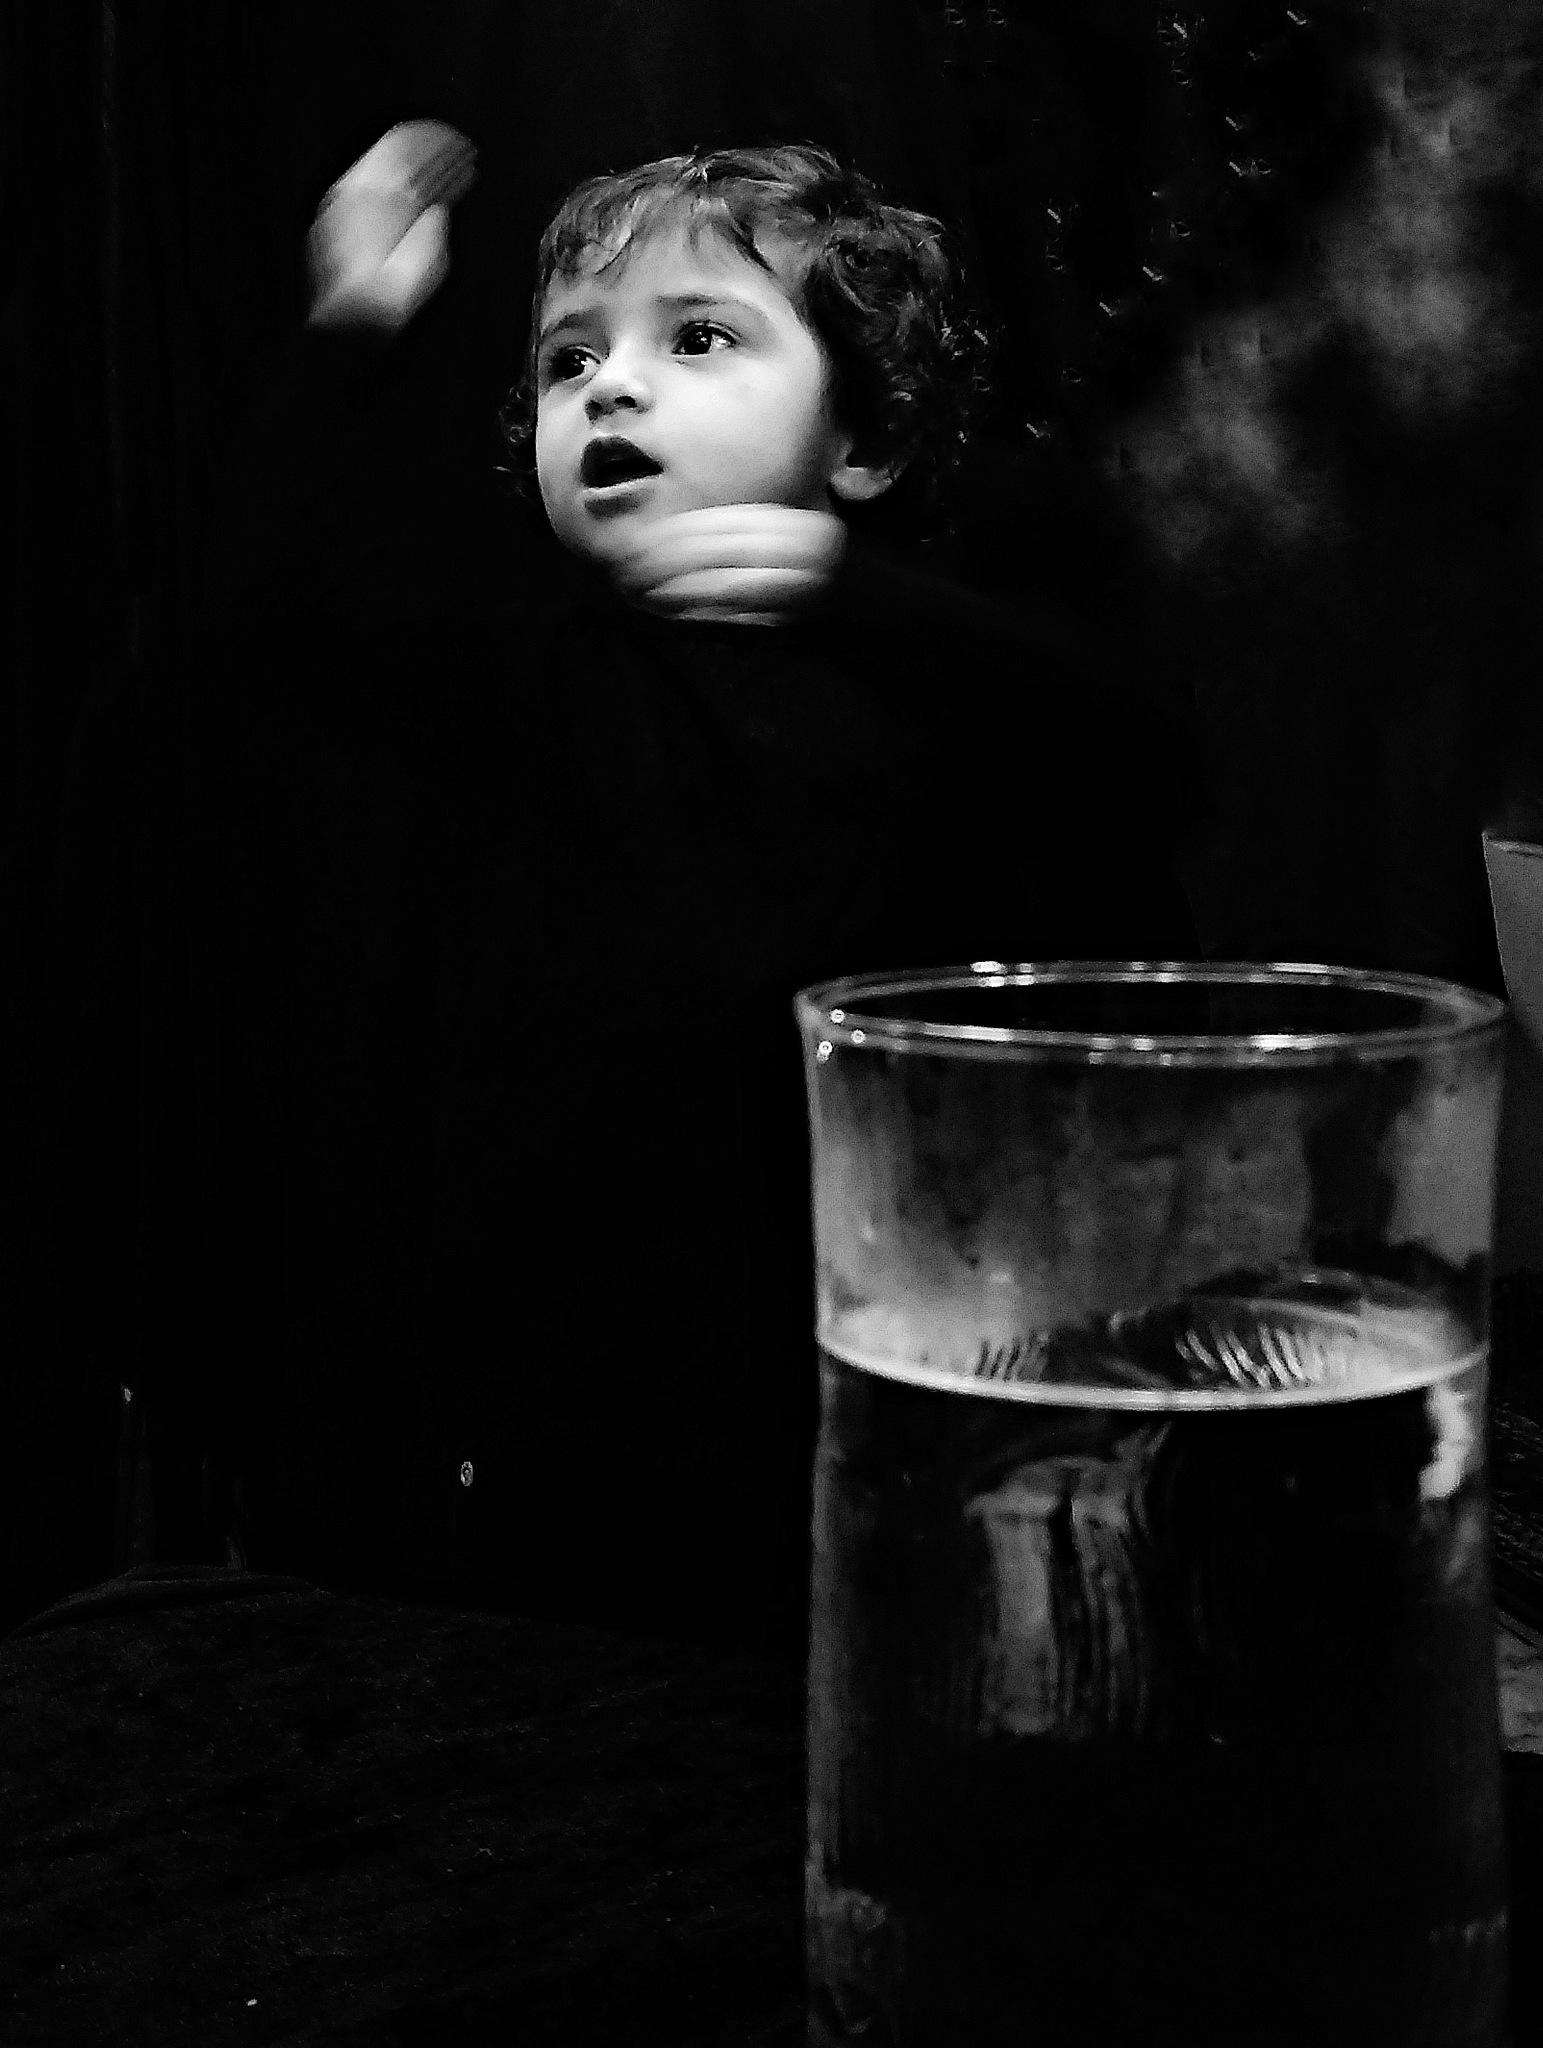 Untitled by AbdelAzim Altaghloby